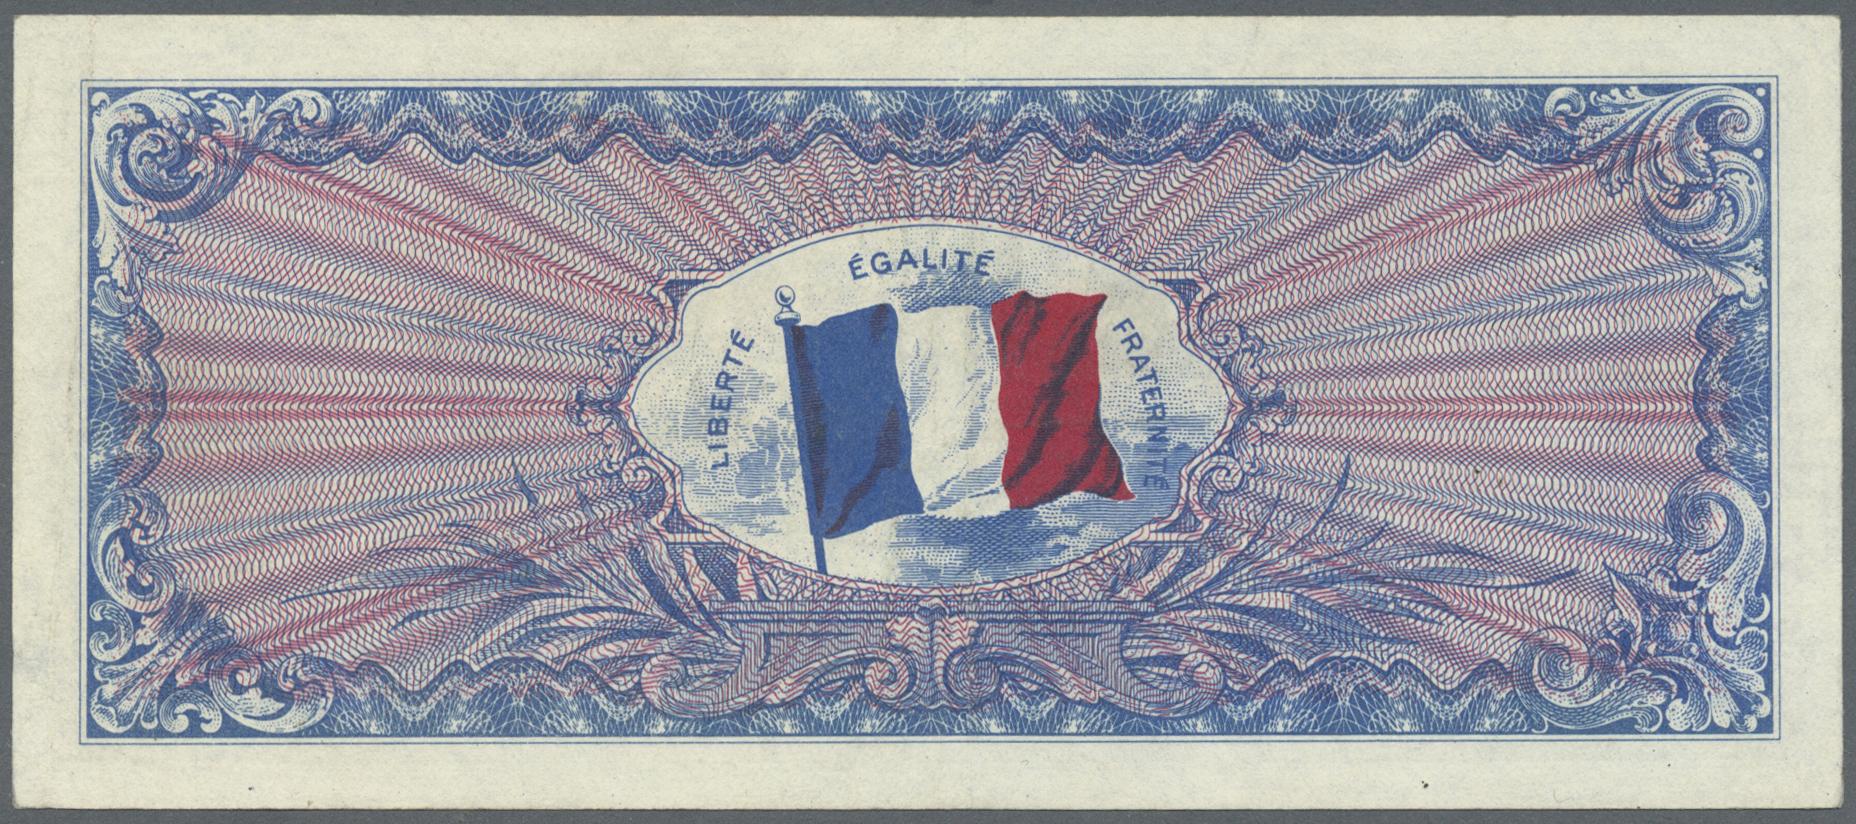 Lot 256 - France / Frankreich   Banknoten  -  Auktionshaus Christoph Gärtner GmbH & Co. KG Sale #49 Coins and Banknotes